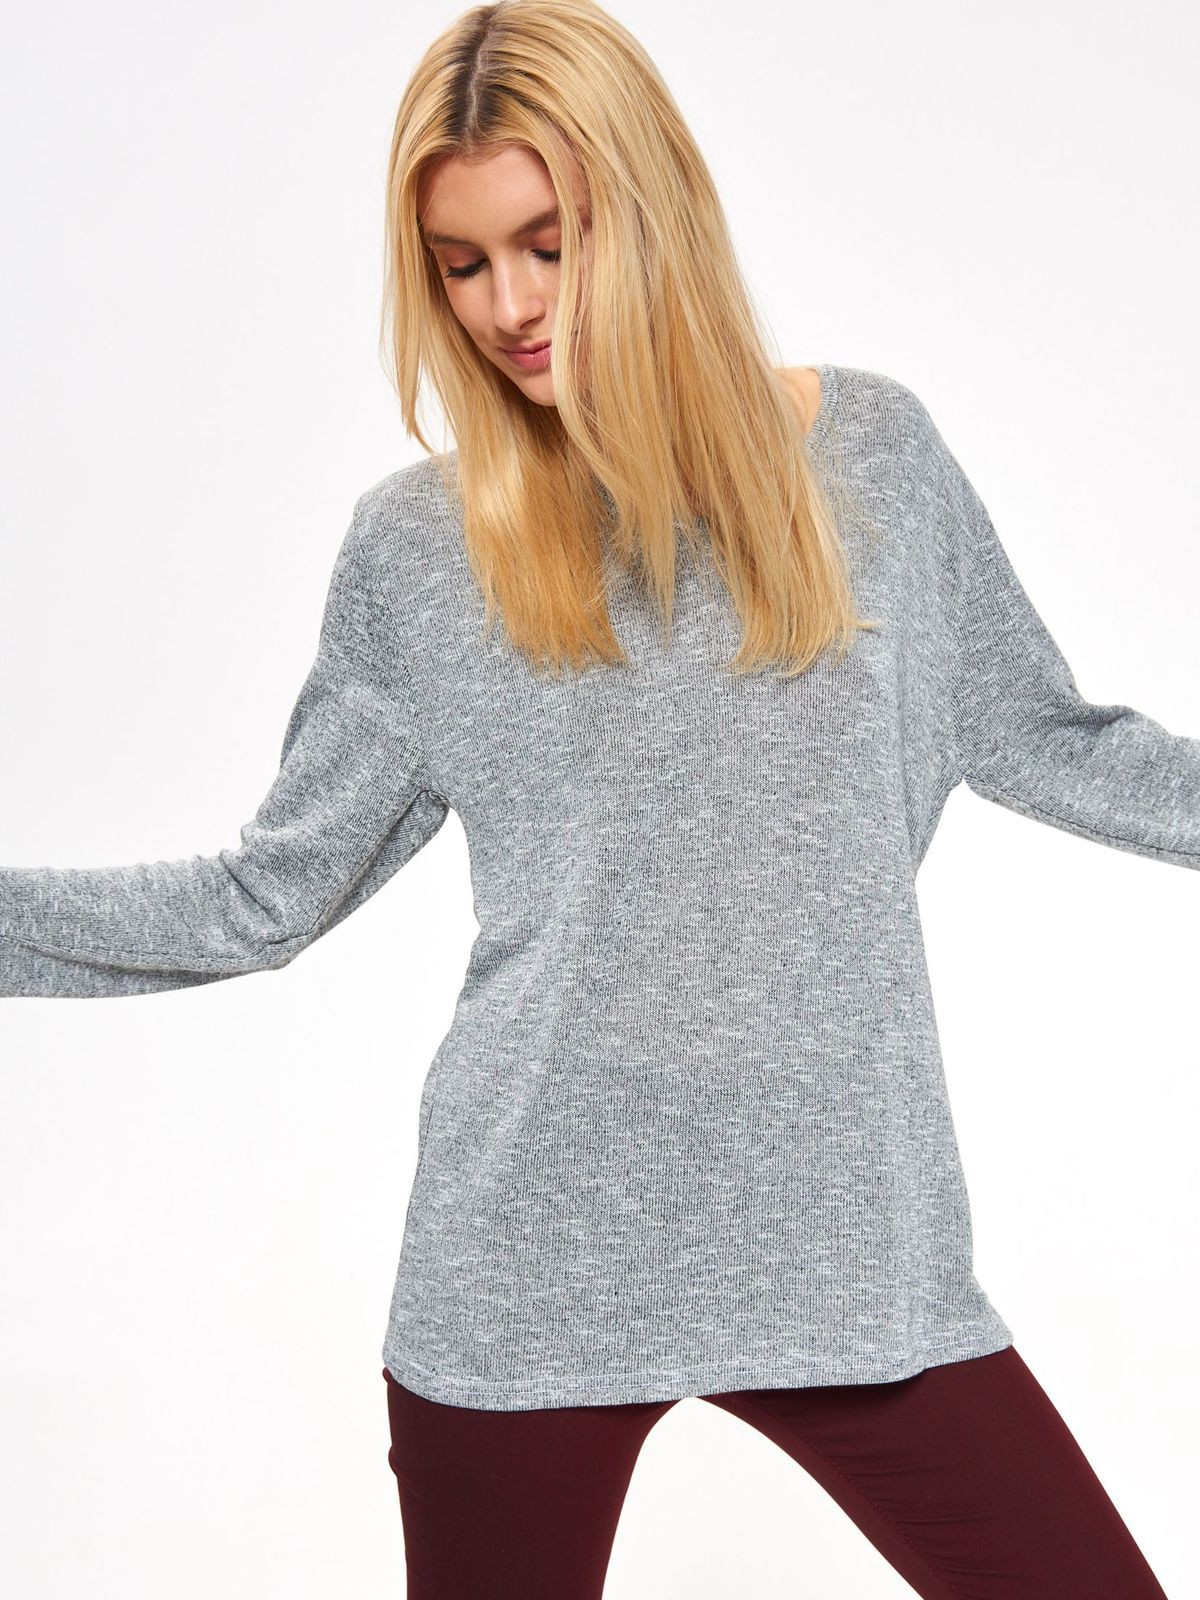 294263154f41 TROLL TROLL γυναικεια λεπτη μπλουζα